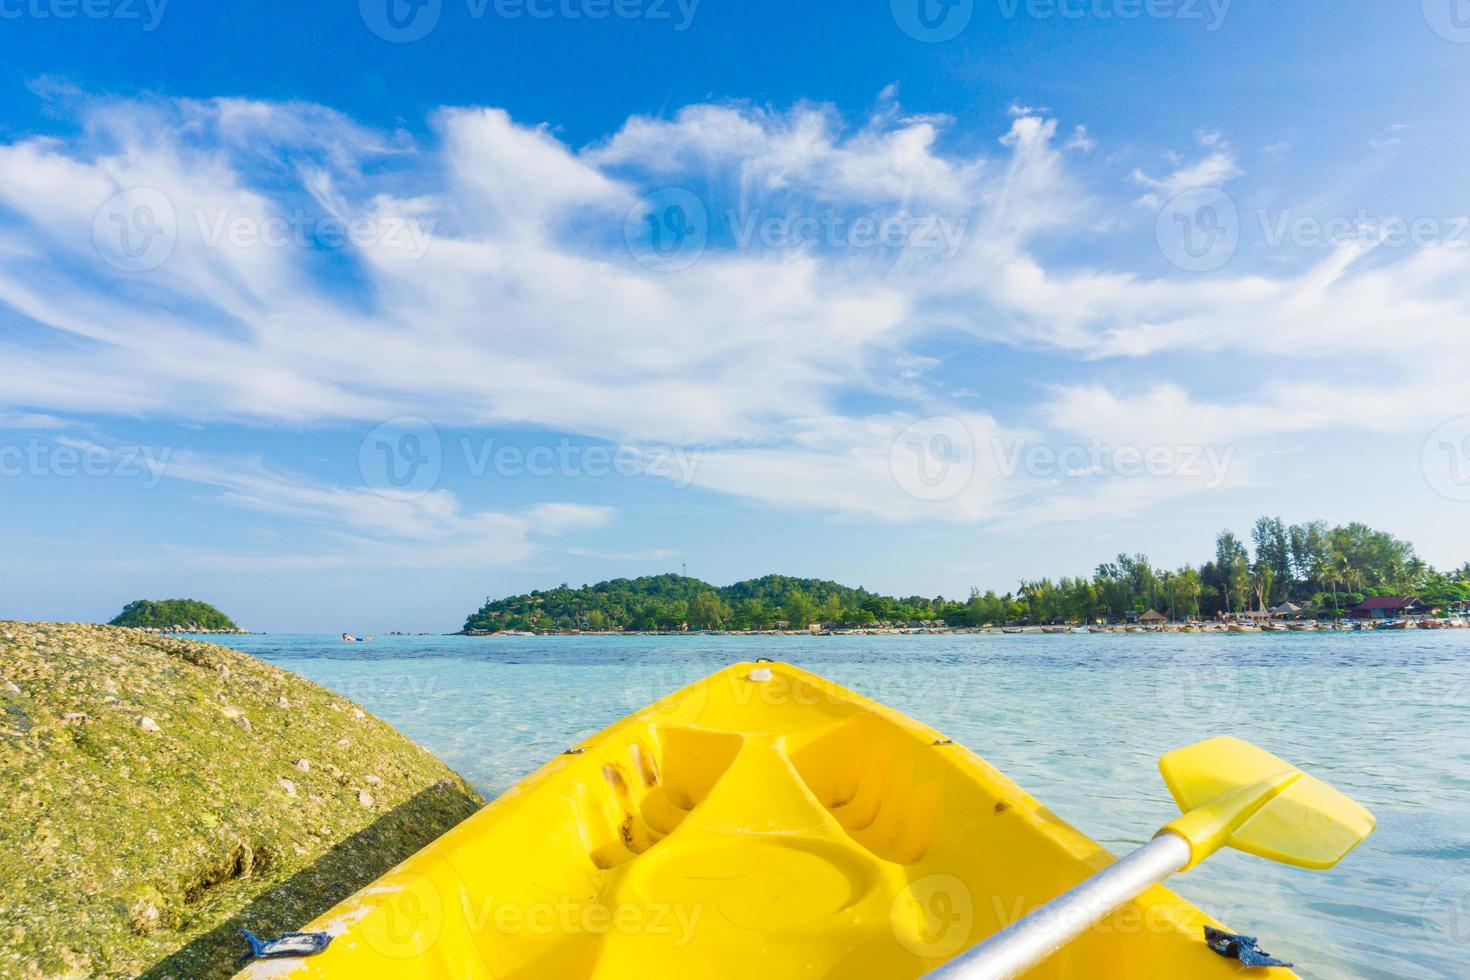 vor dem Kajakfahren, Meer auf lipe Insel foto